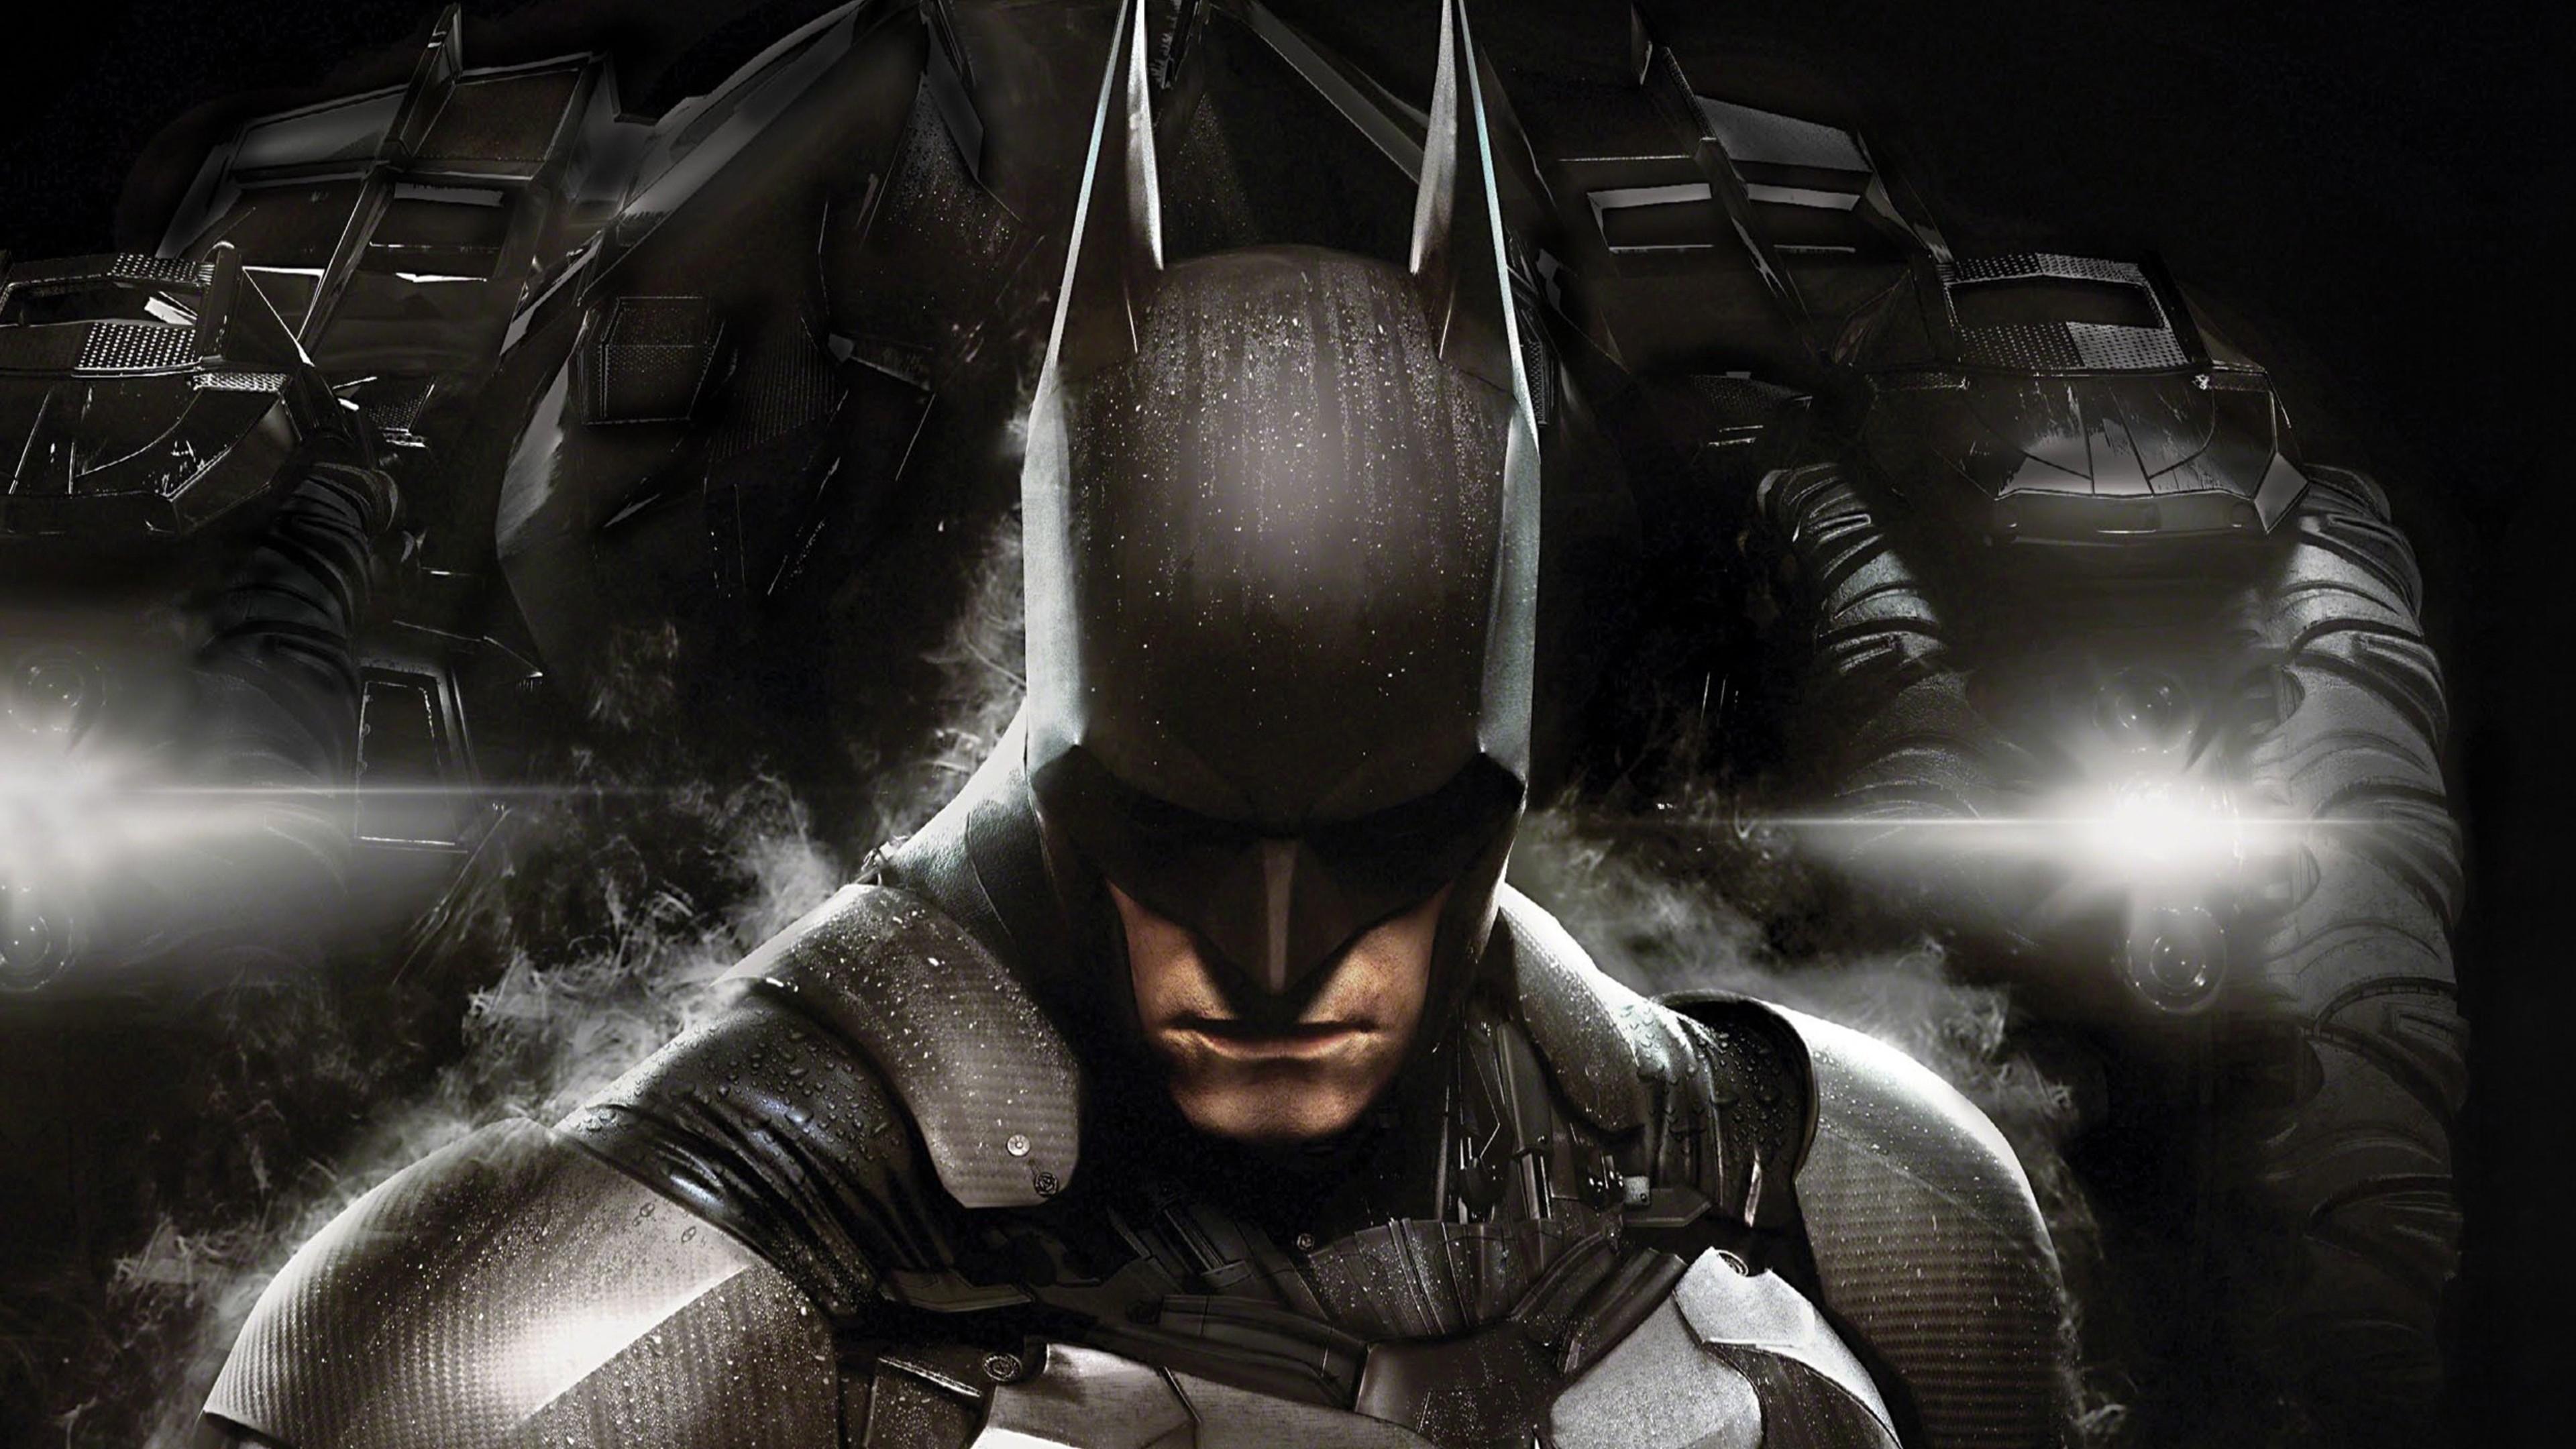 batman arkham knight full hd hd movies 4k wallpapers images